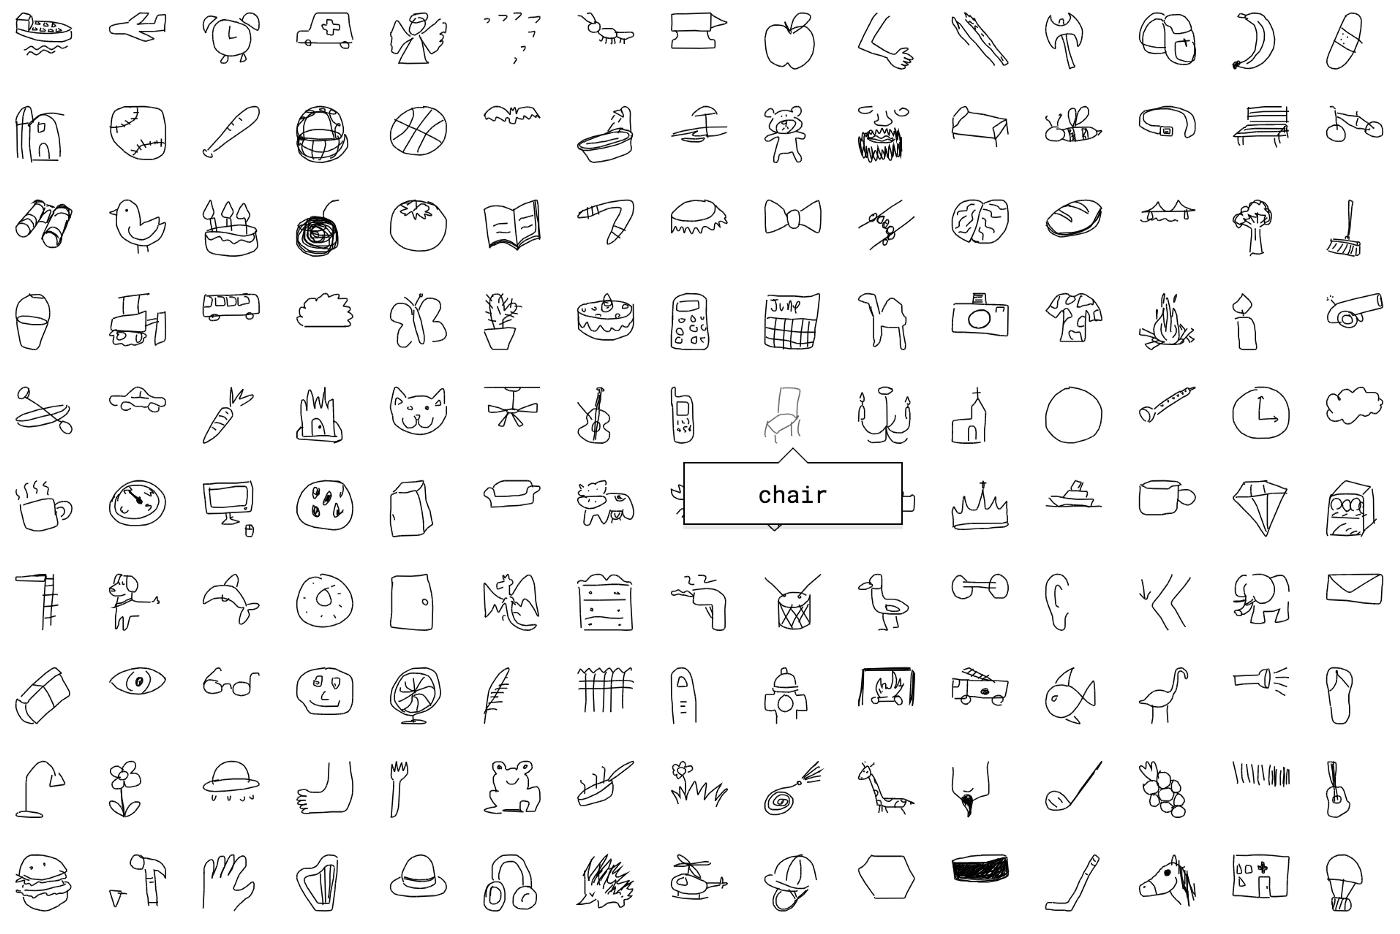 Google Draw open dataset